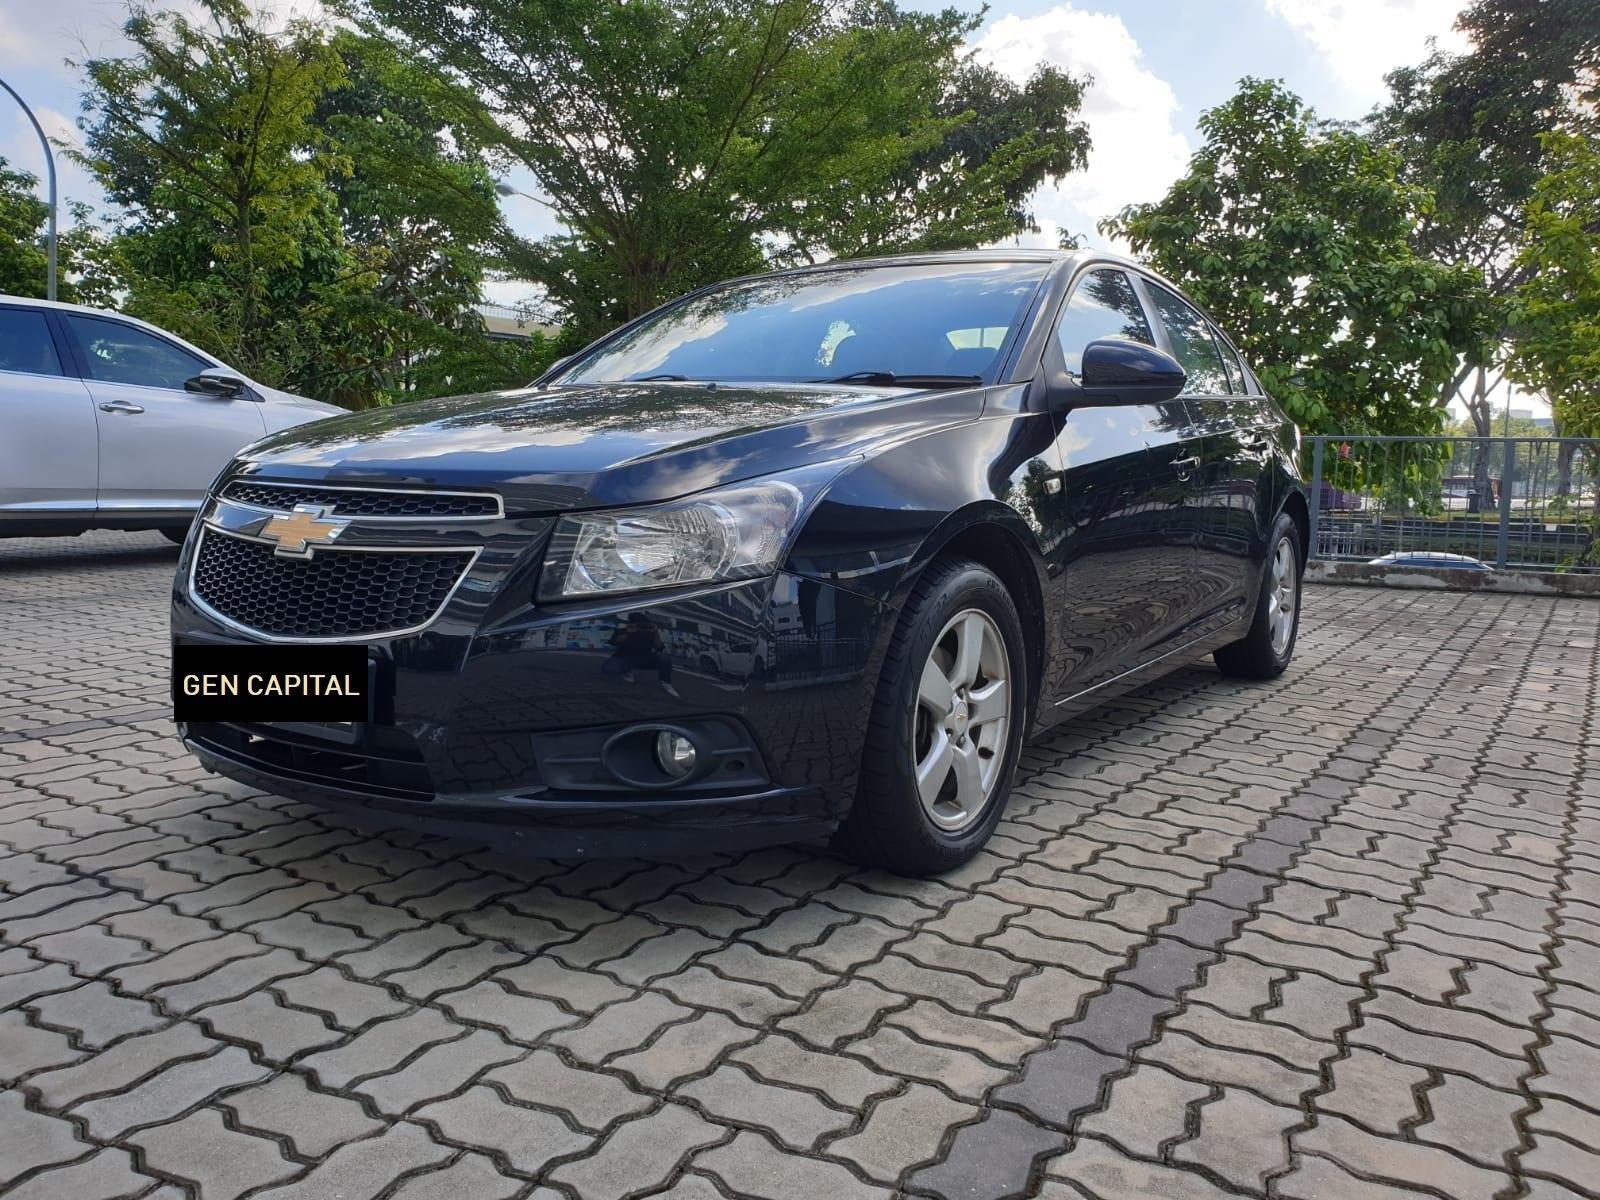 Chevrolet Cruze *Lowest rental rates, good condition!